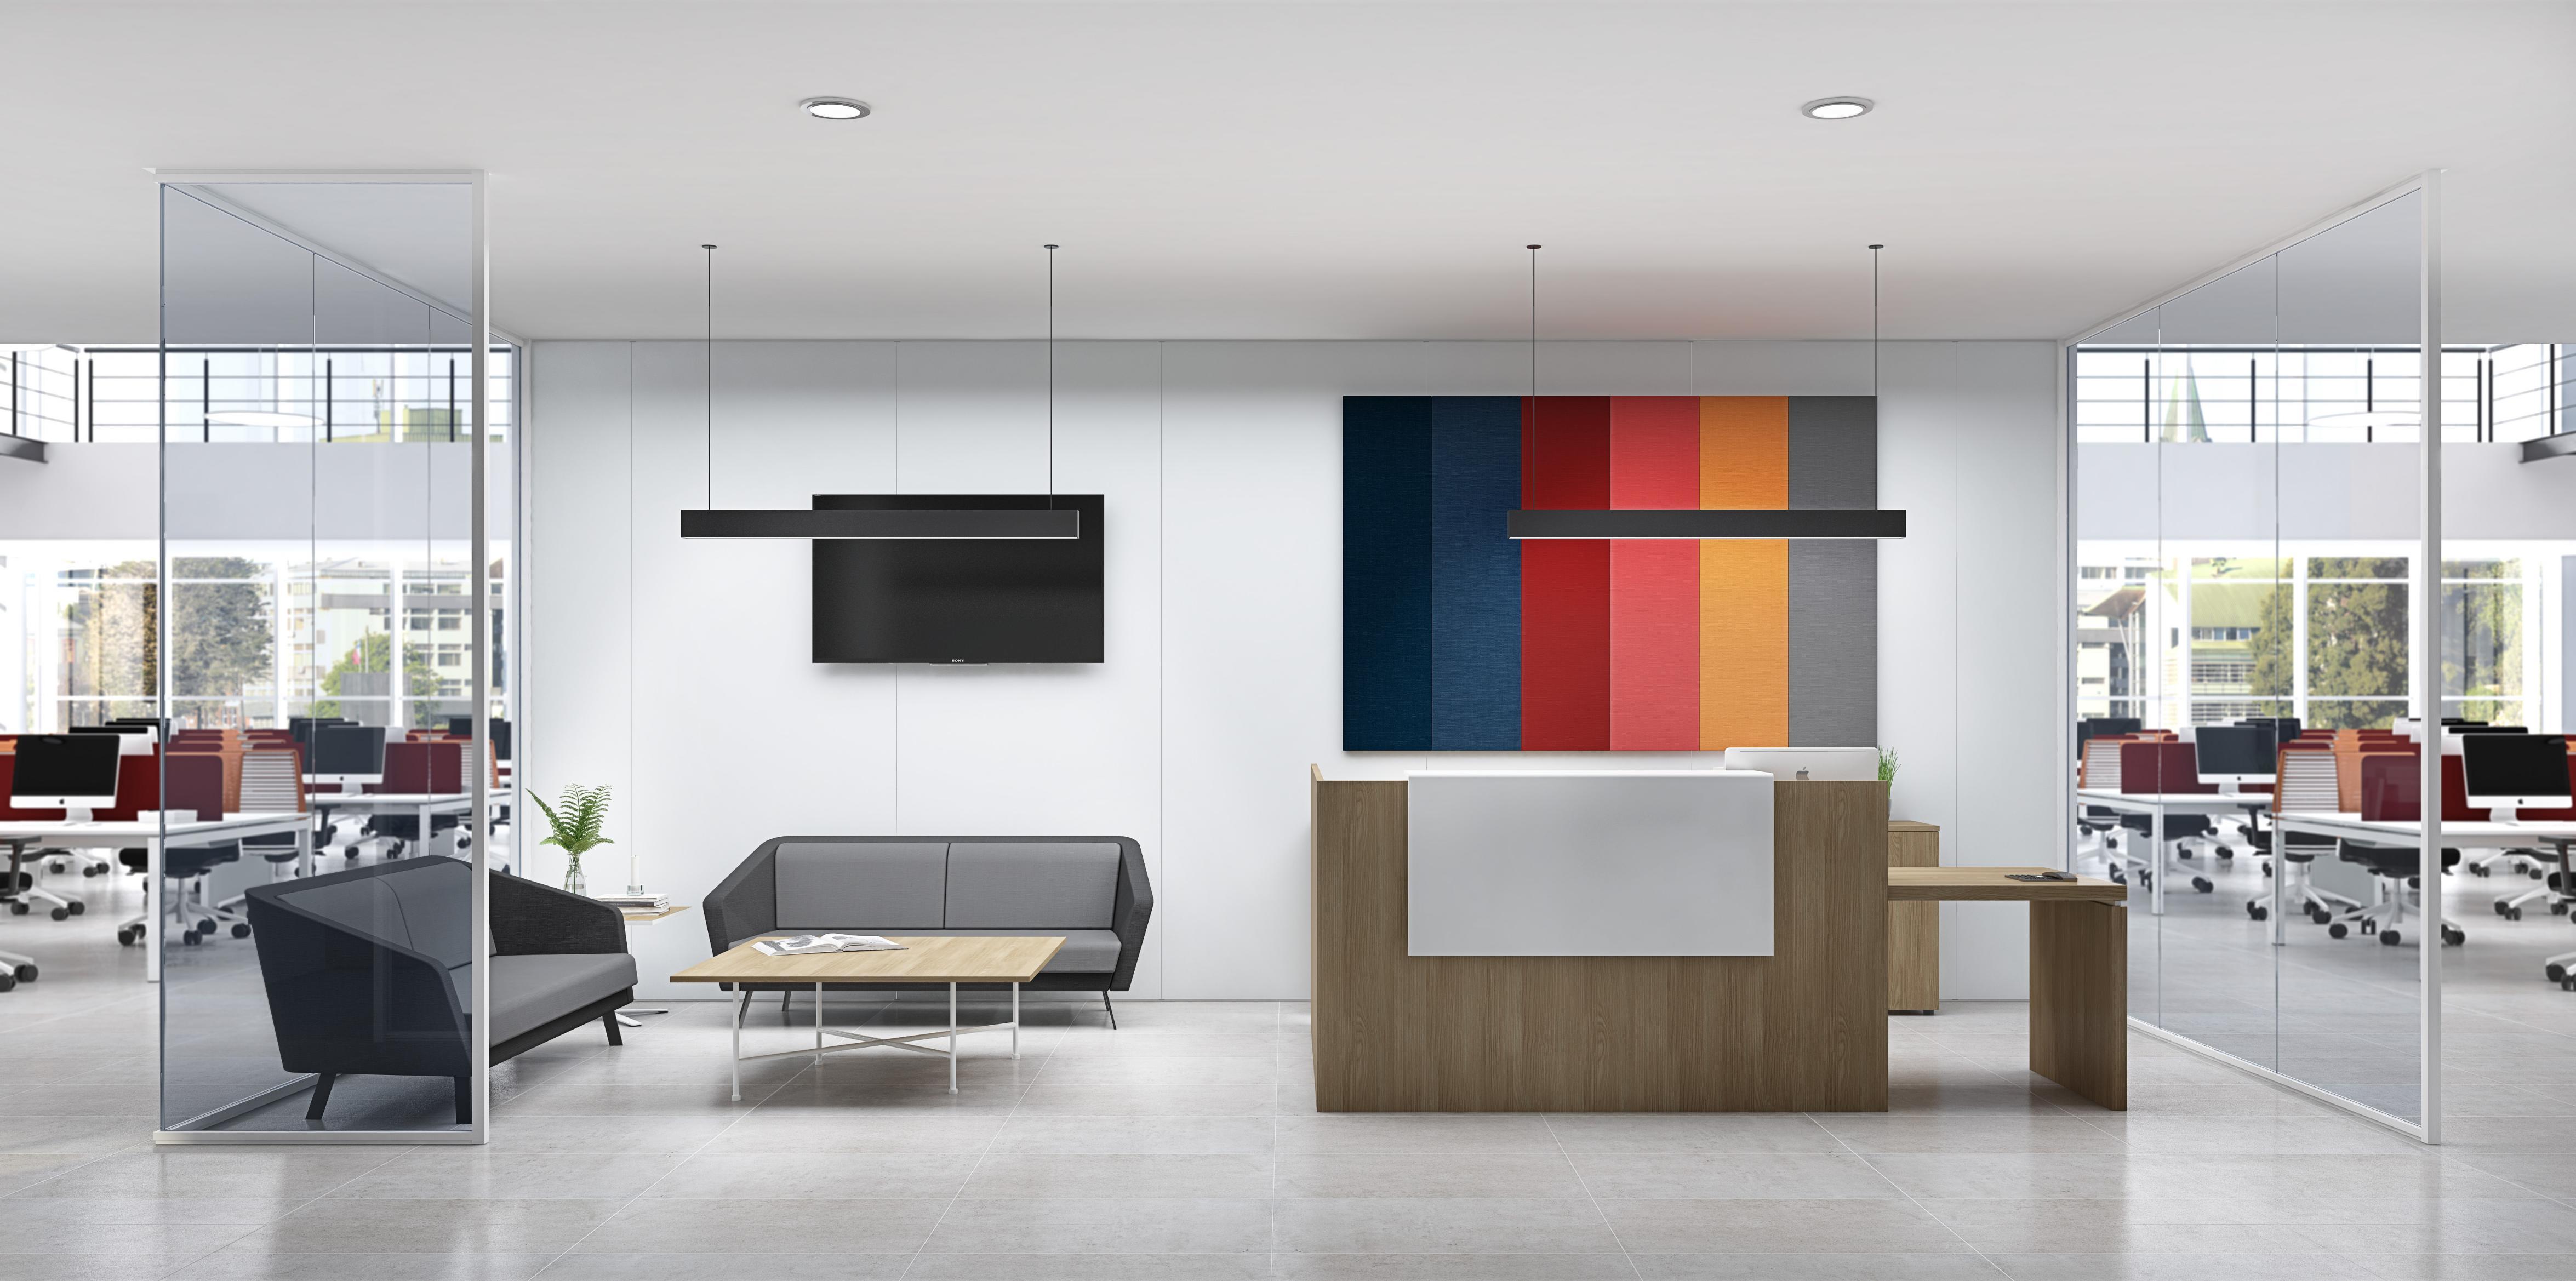 mobiliario oficina galeria6 1 - mobiliario de oficina